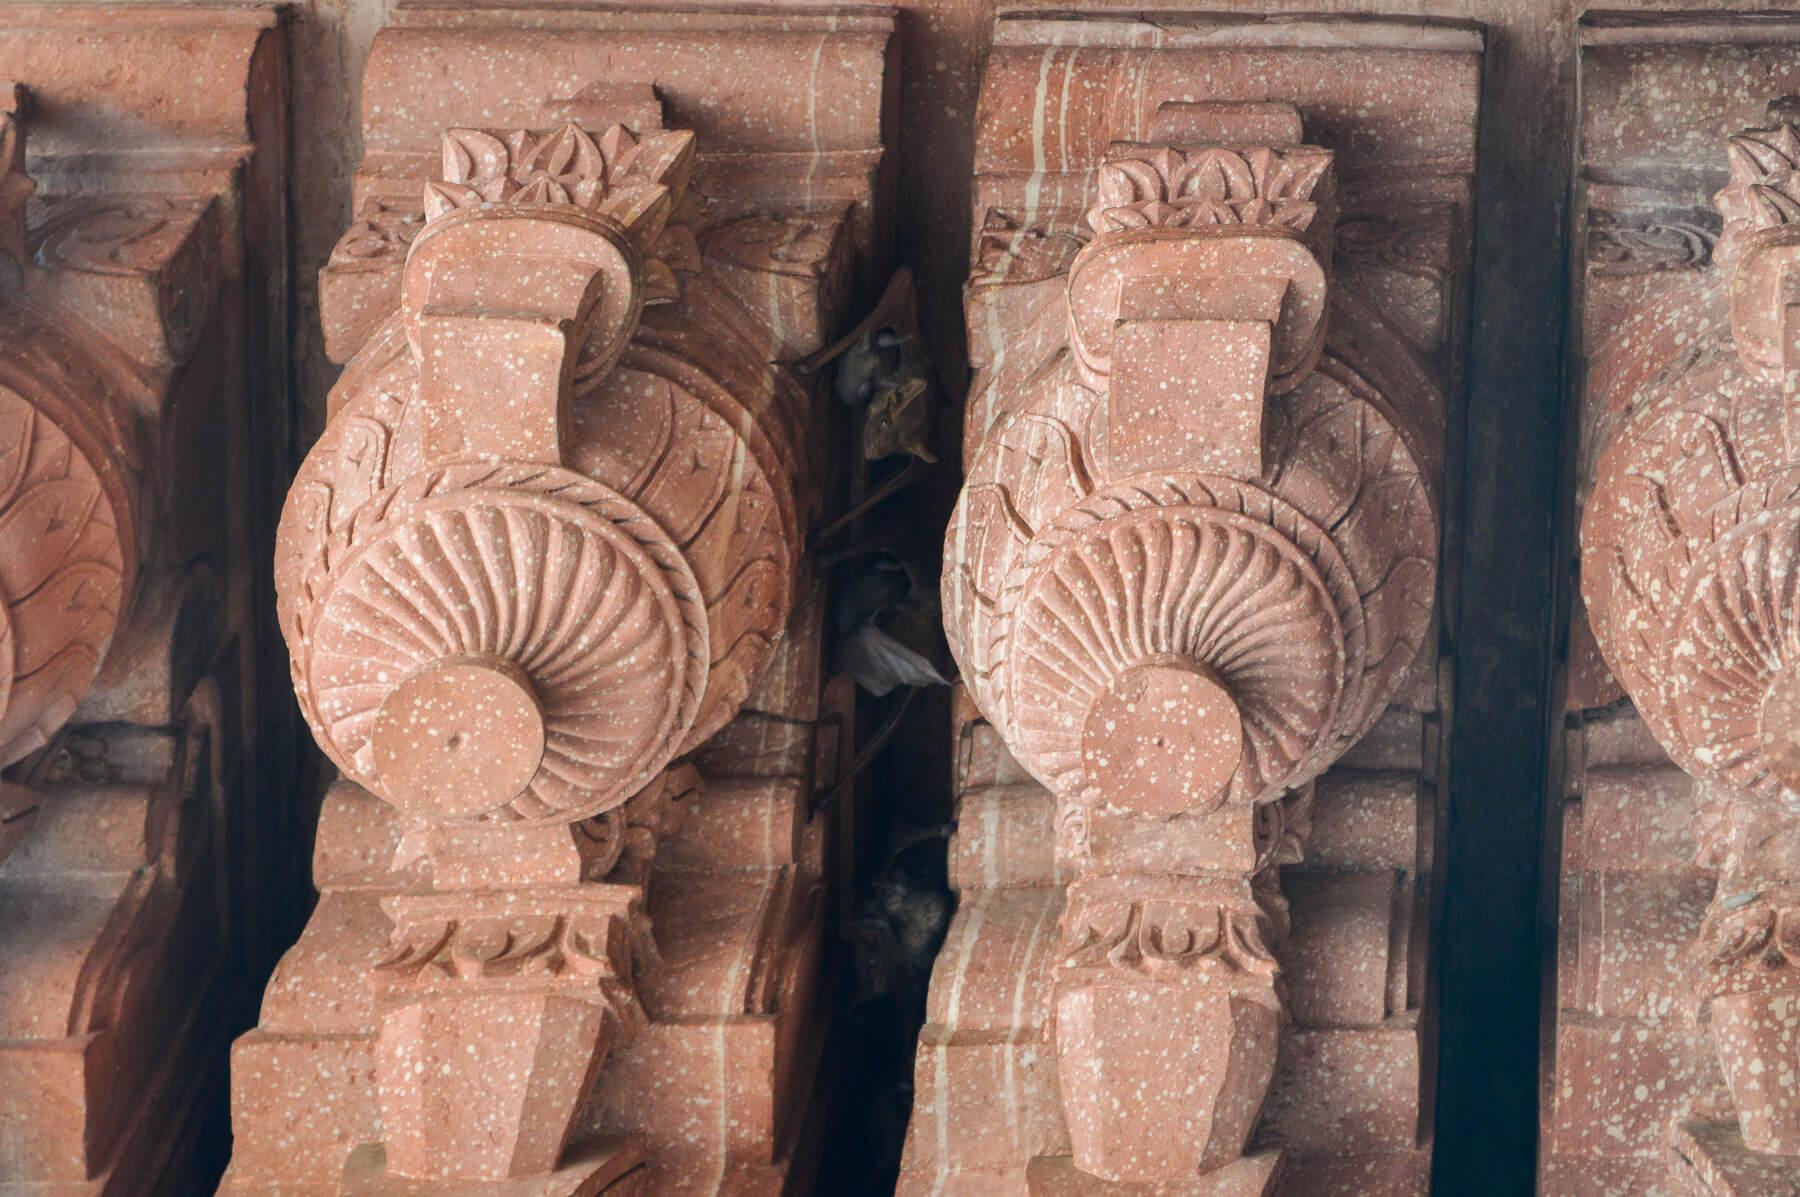 Bats hiding in the shadows of terracotta pillars